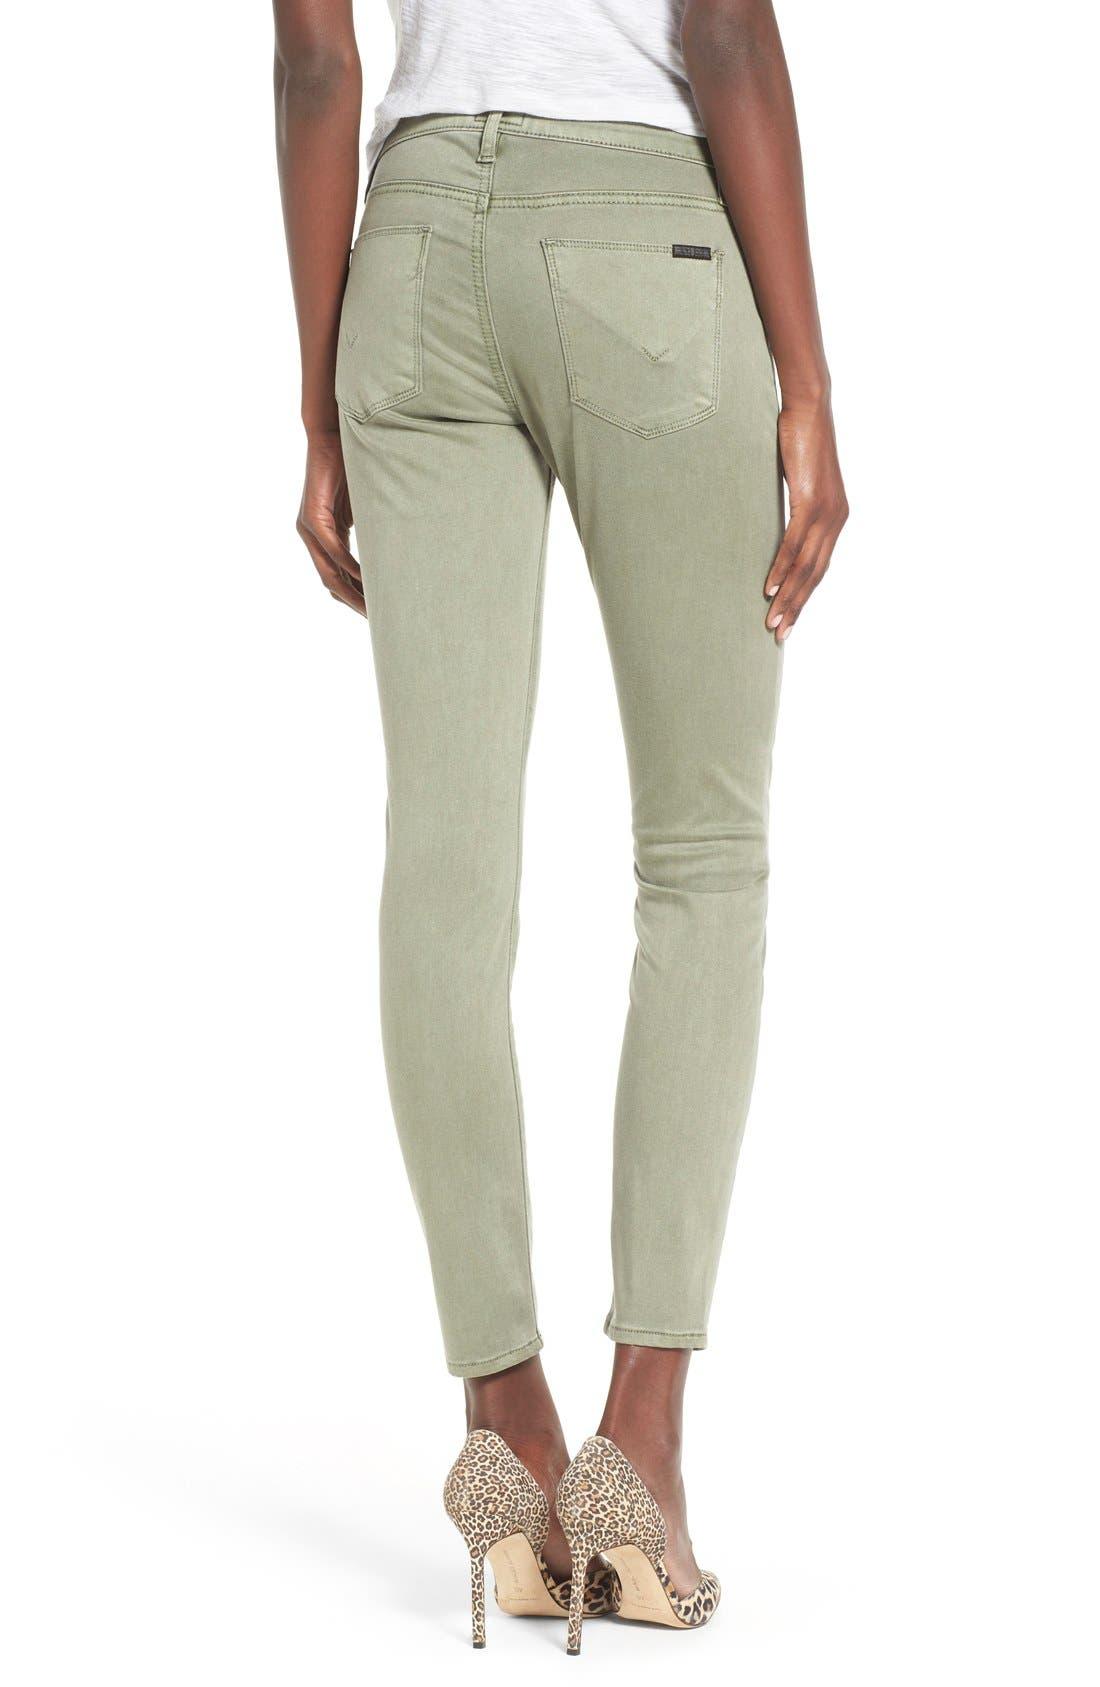 Alternate Image 2  - Hudson Jeans 'Nico' Ankle Super Skinny Jeans (Earth Works)